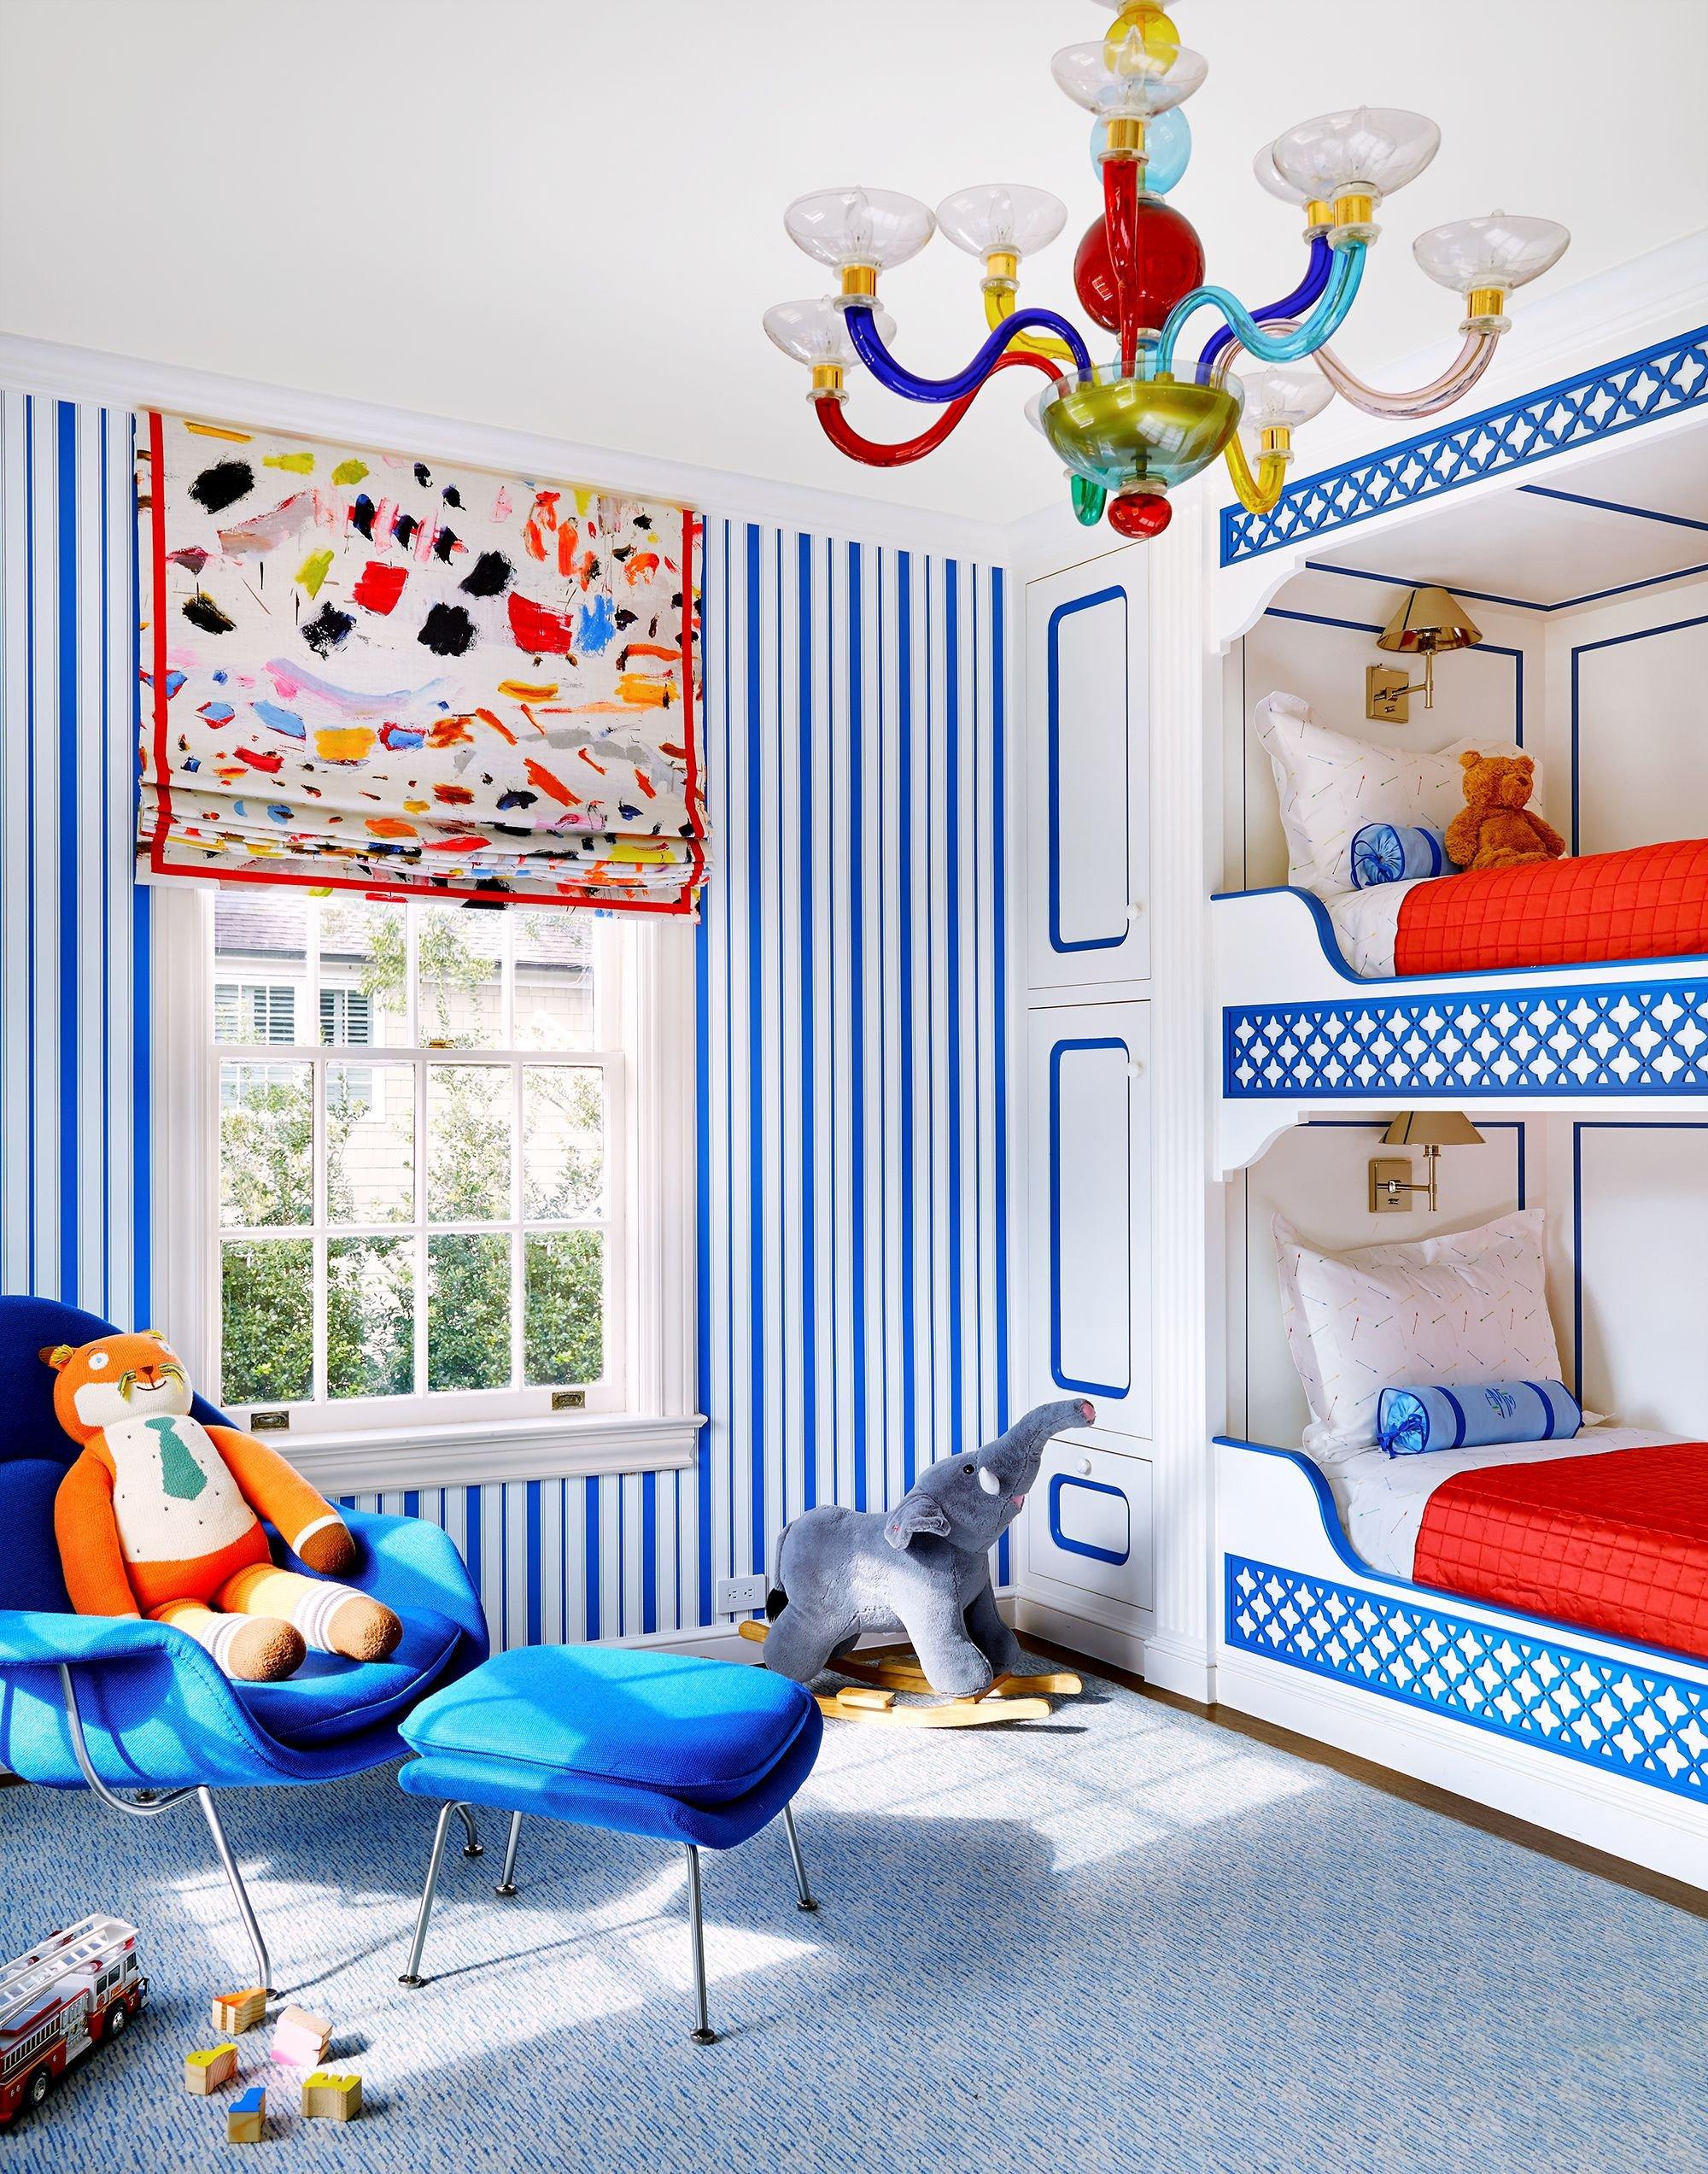 Kid Bedroom Decorating Idea Fresh 55 Kids Room Design Ideas Cool Kids Bedroom Decor and Style